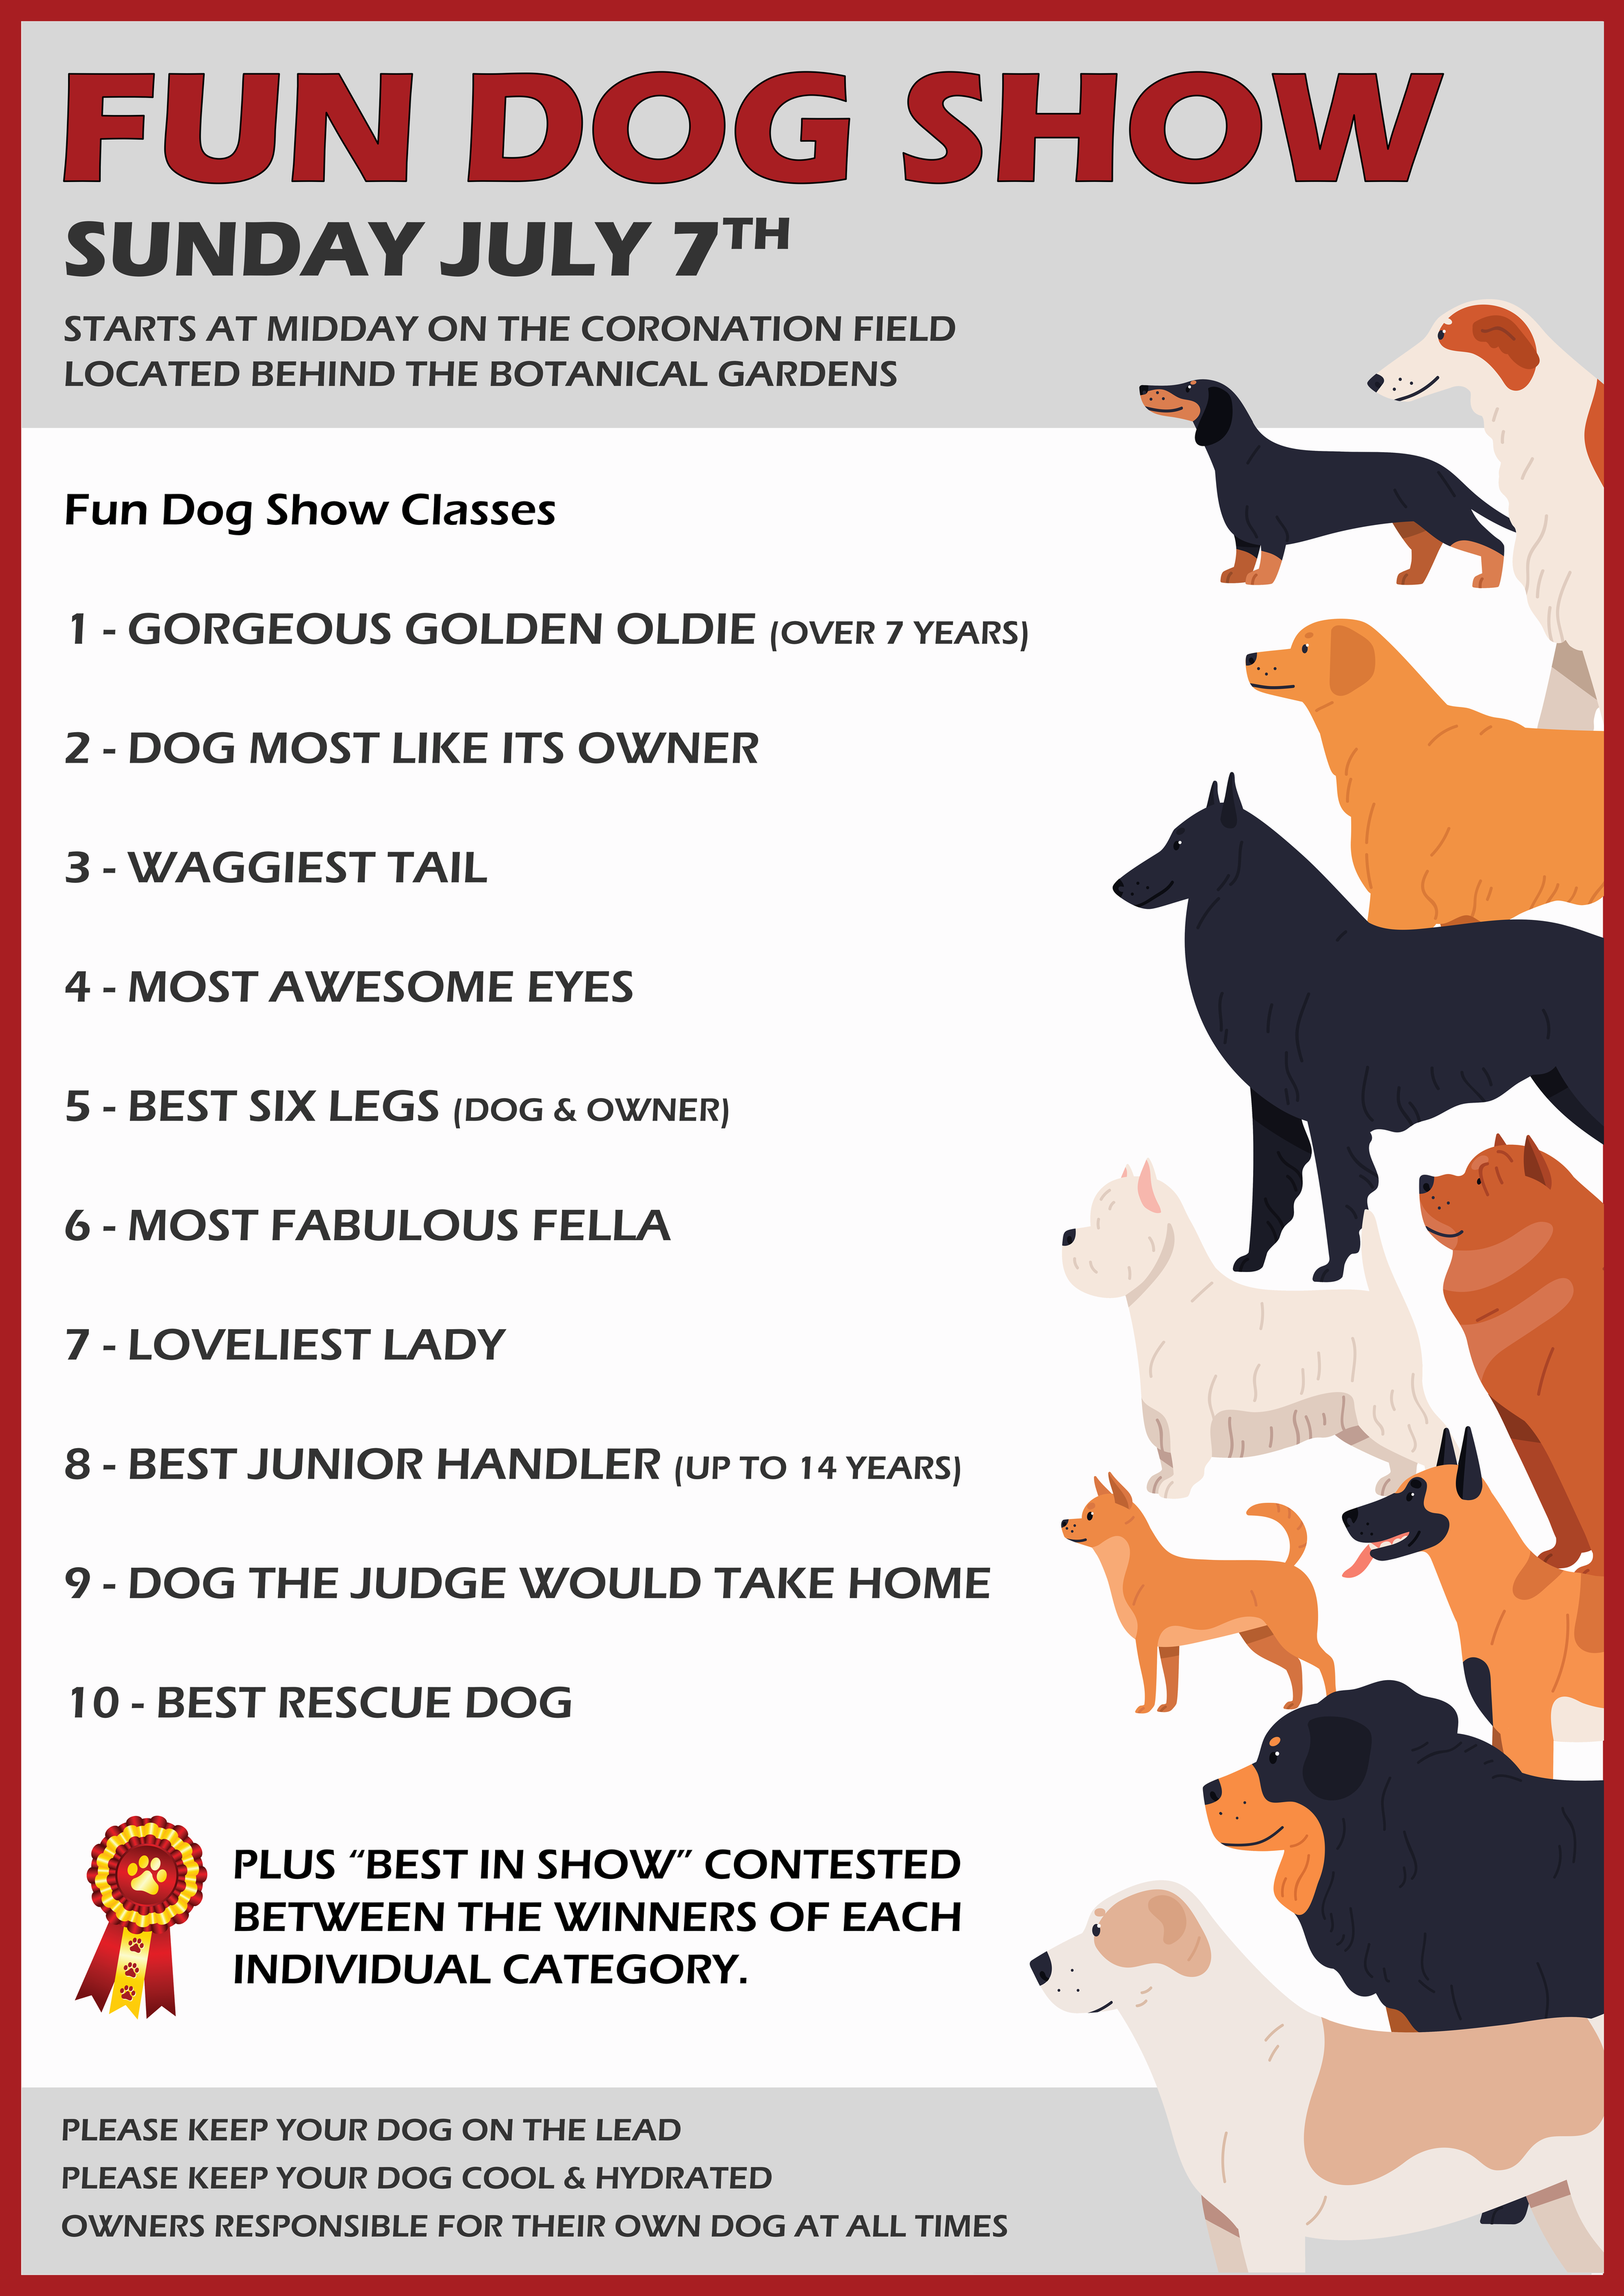 DogShowPosterBanner.png